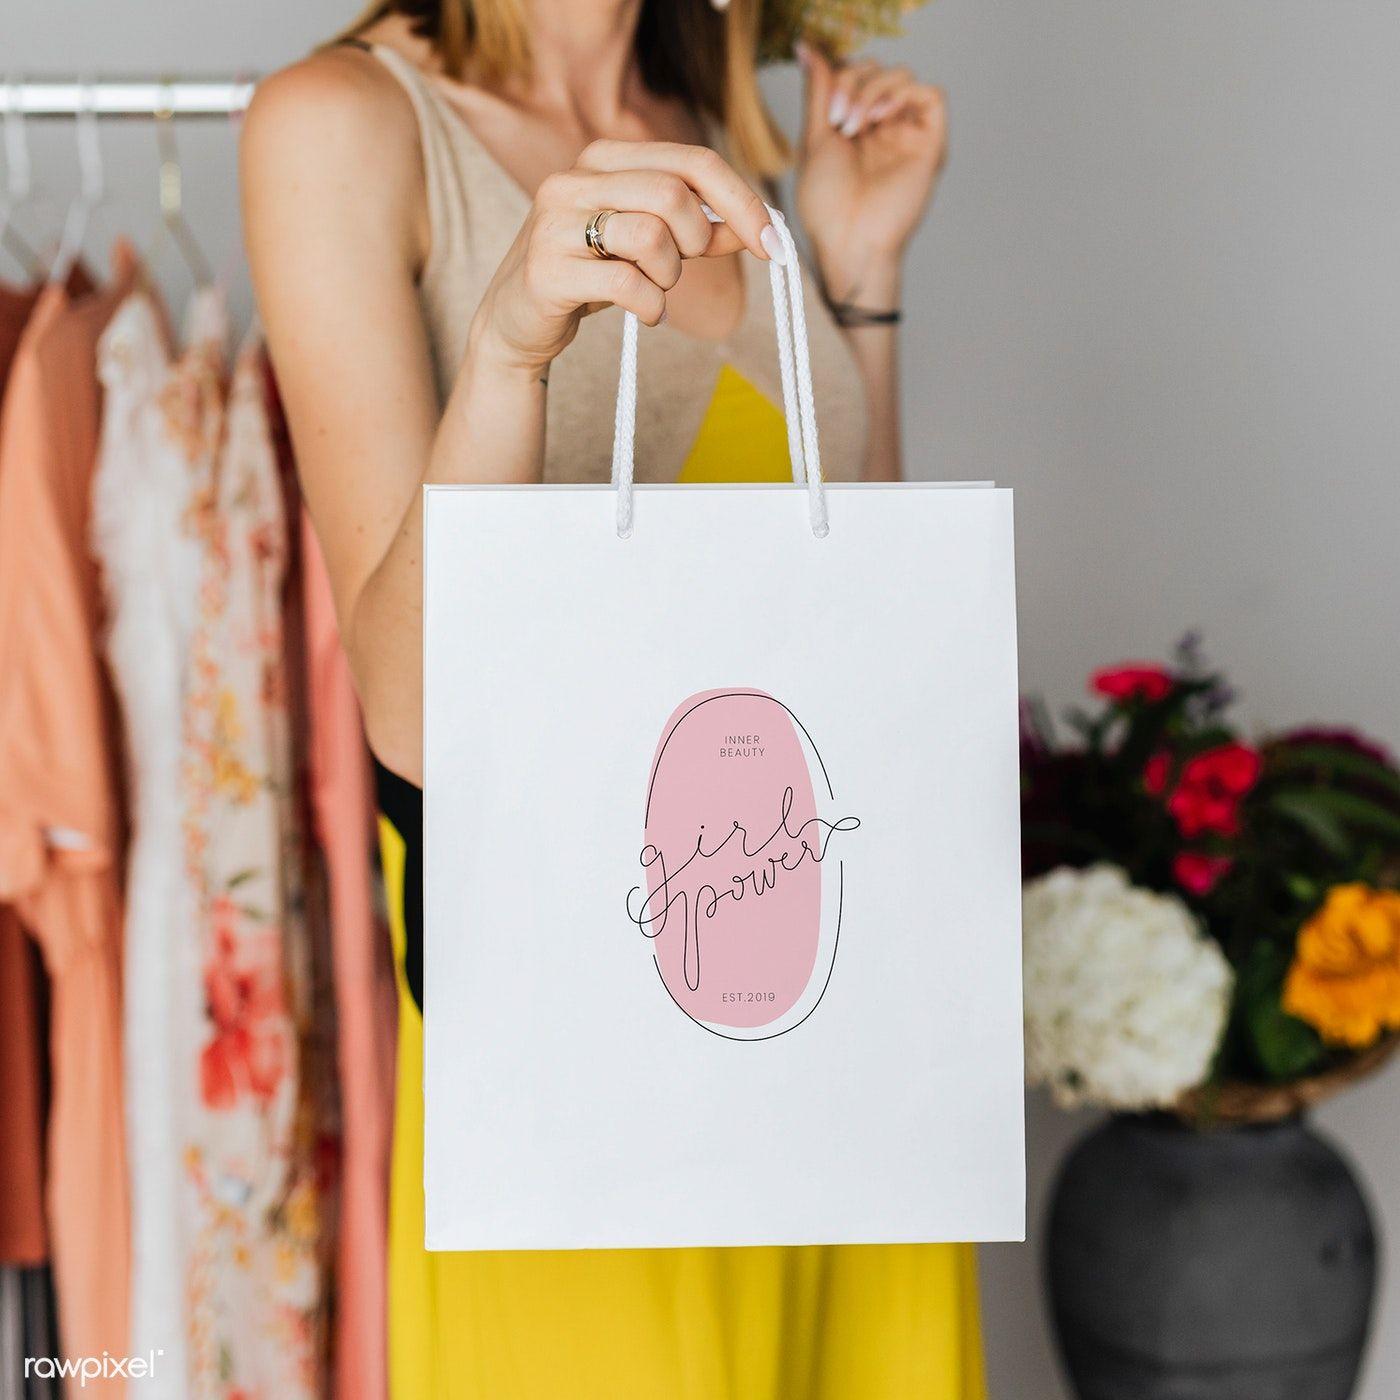 Download Download Premium Psd Of Woman Carrying A Shopping Paper Bag Mockup 1208072 In 2020 Bag Mockup Paper Bag Design Bags Designer Fashion